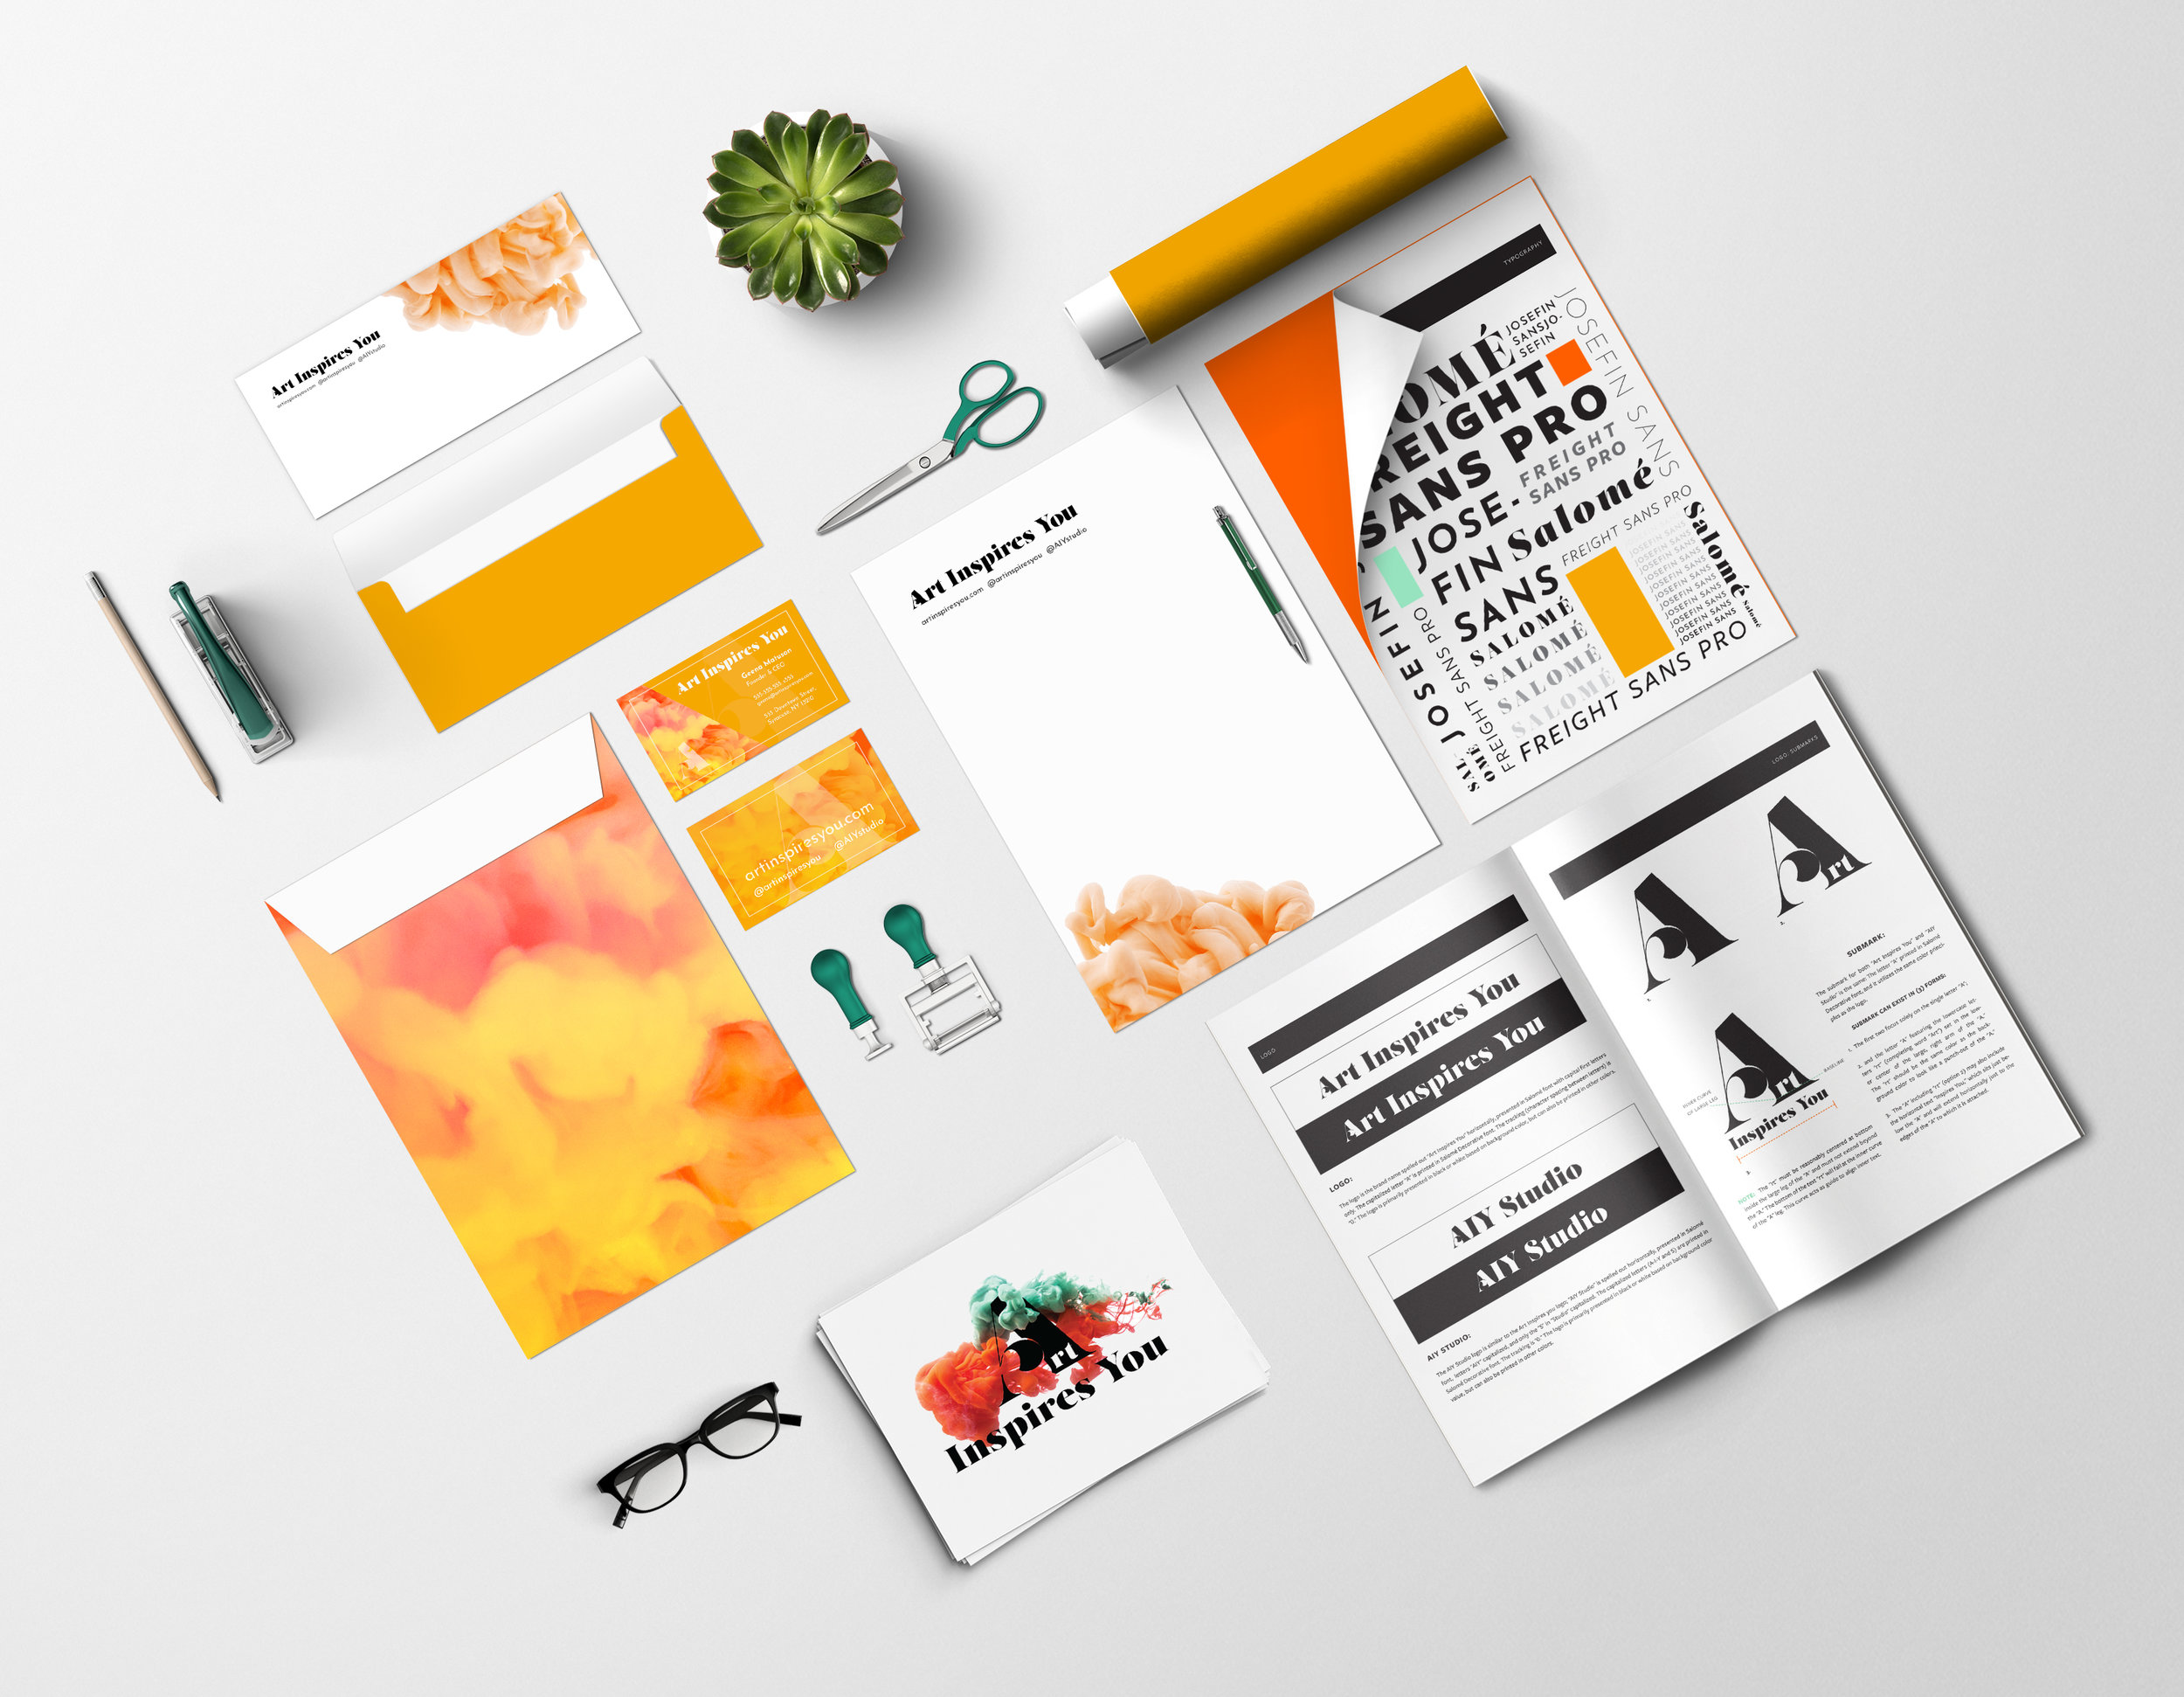 AIY Studio (Art Inspires You) branding and identity by Geena Matuson (@geenamatuson).